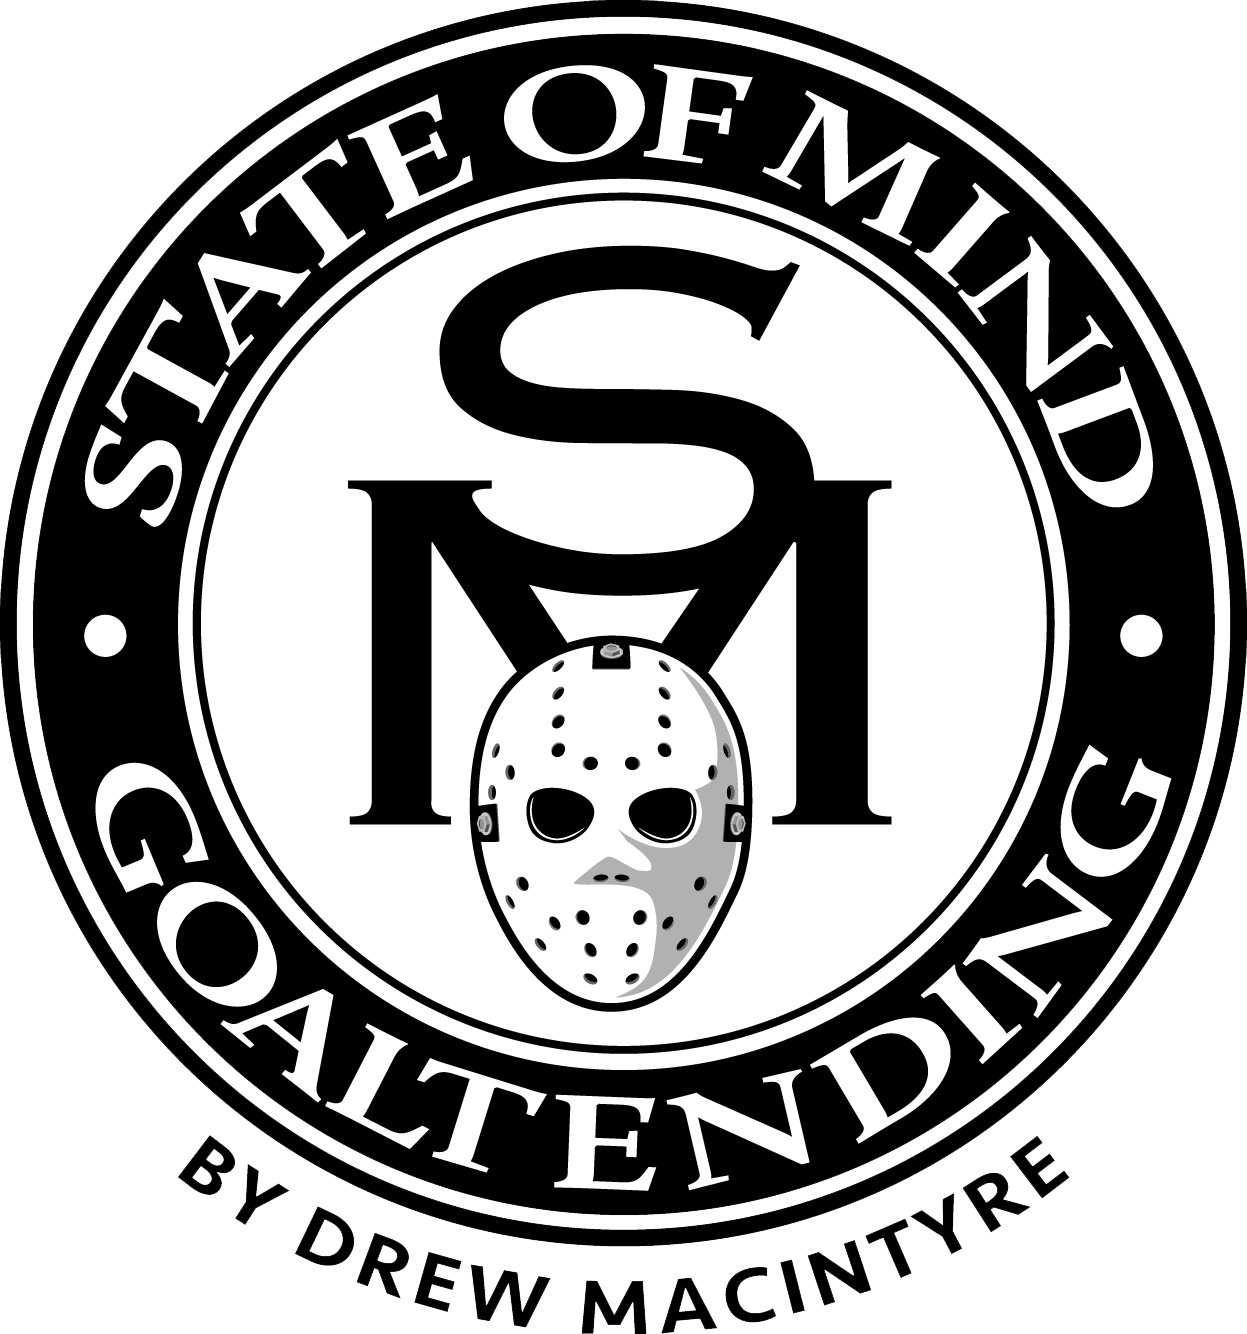 State of Mind Goaltending by Drew MacIntyre